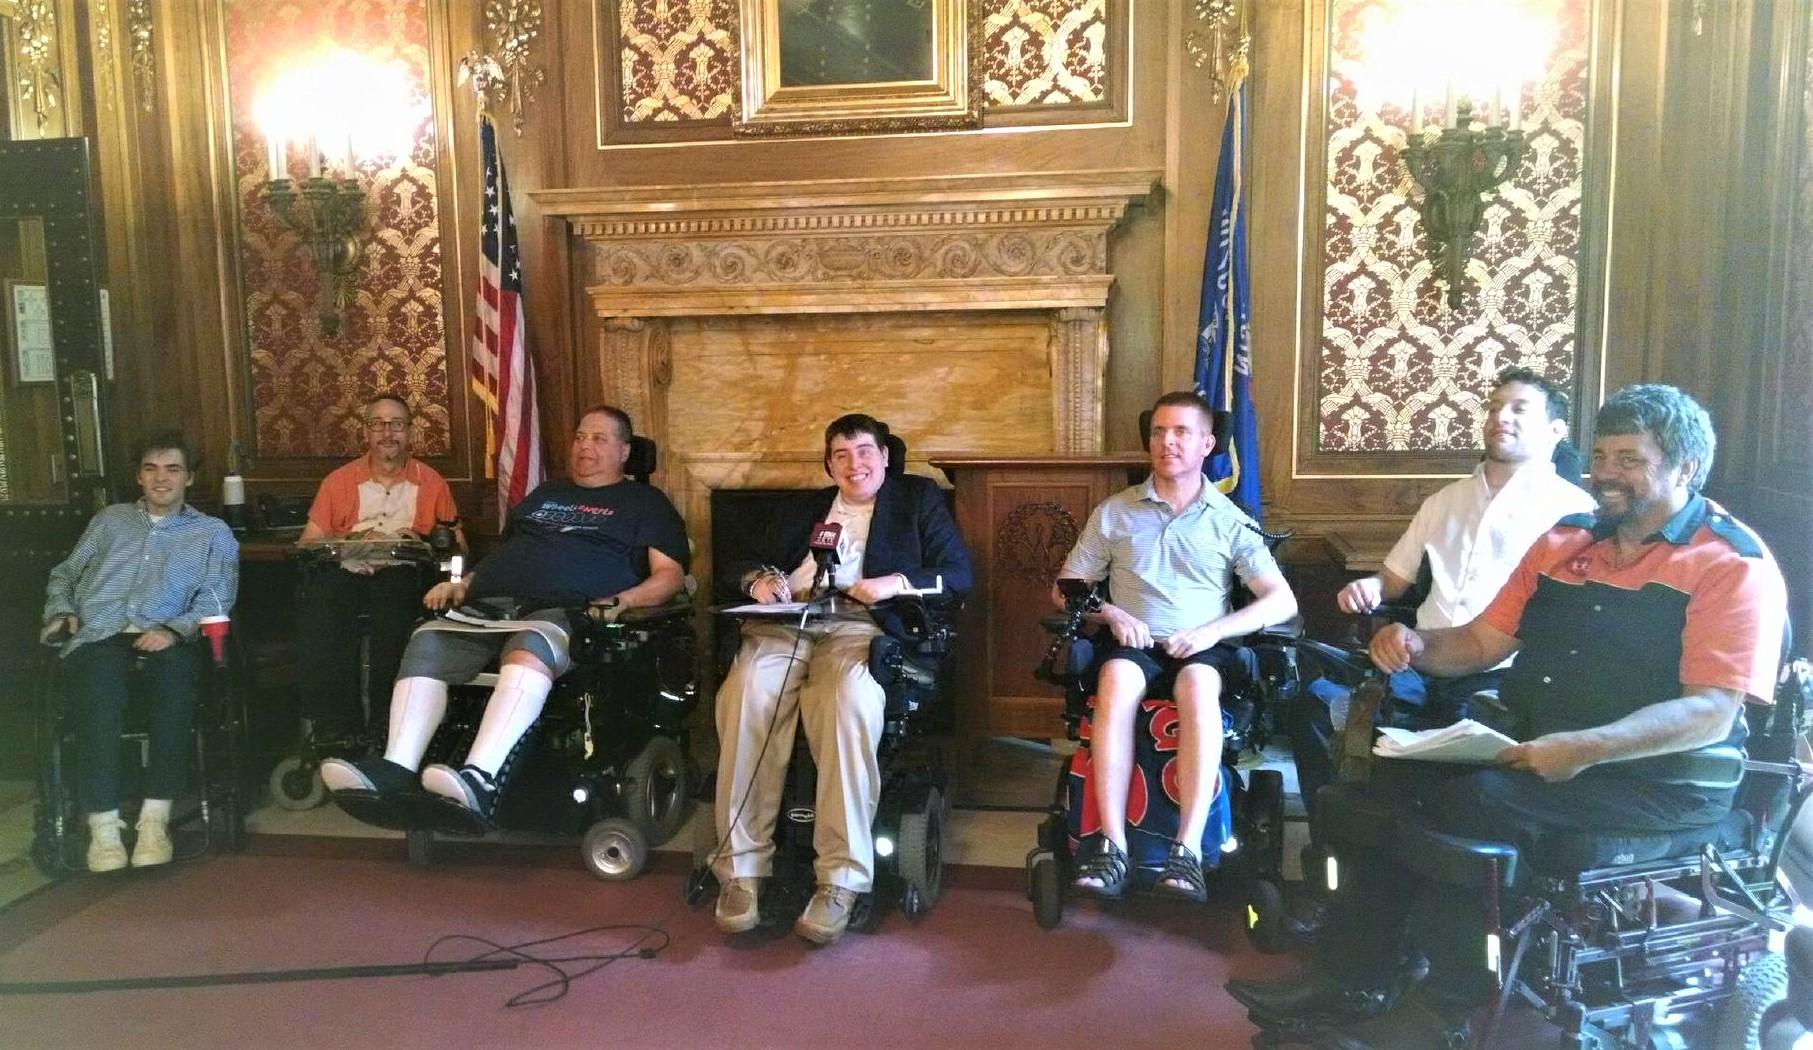 Advisory Board in OH, $10M Wisconsin legislation, $1.5M in SCI grants in MN & more - Cure Advocacy Network (CAN)